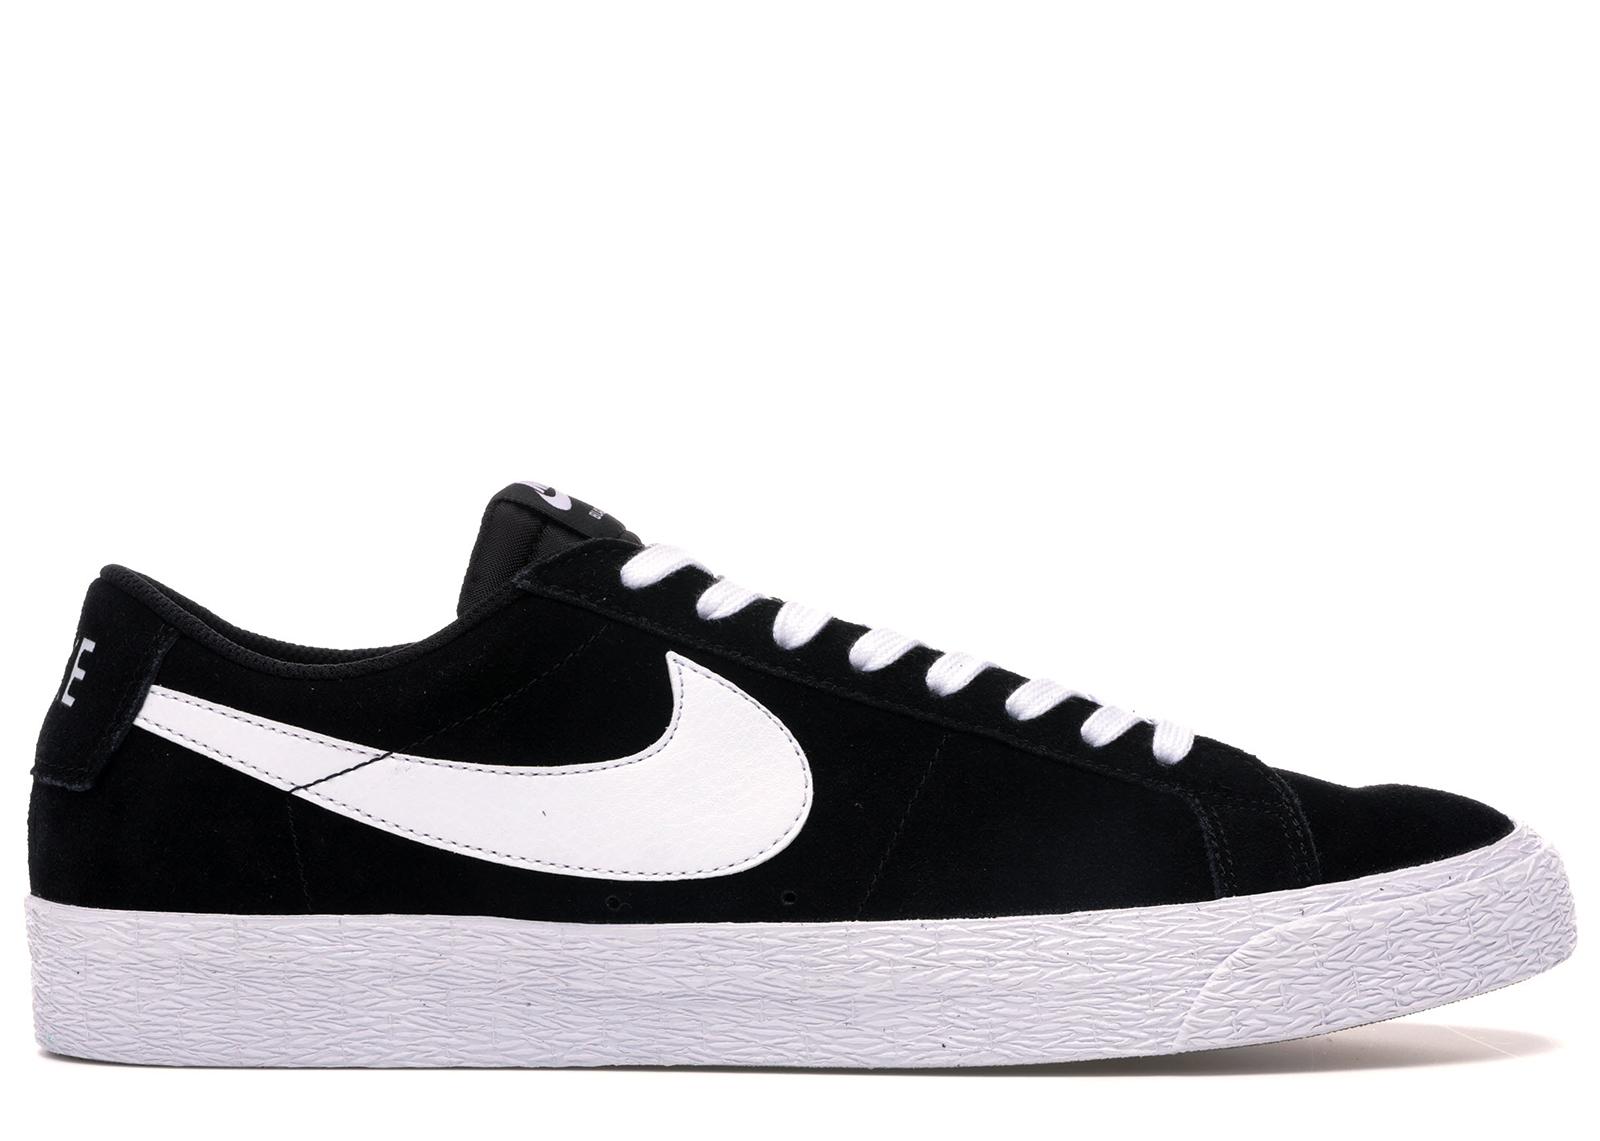 Nike SB Blazer Low Black White